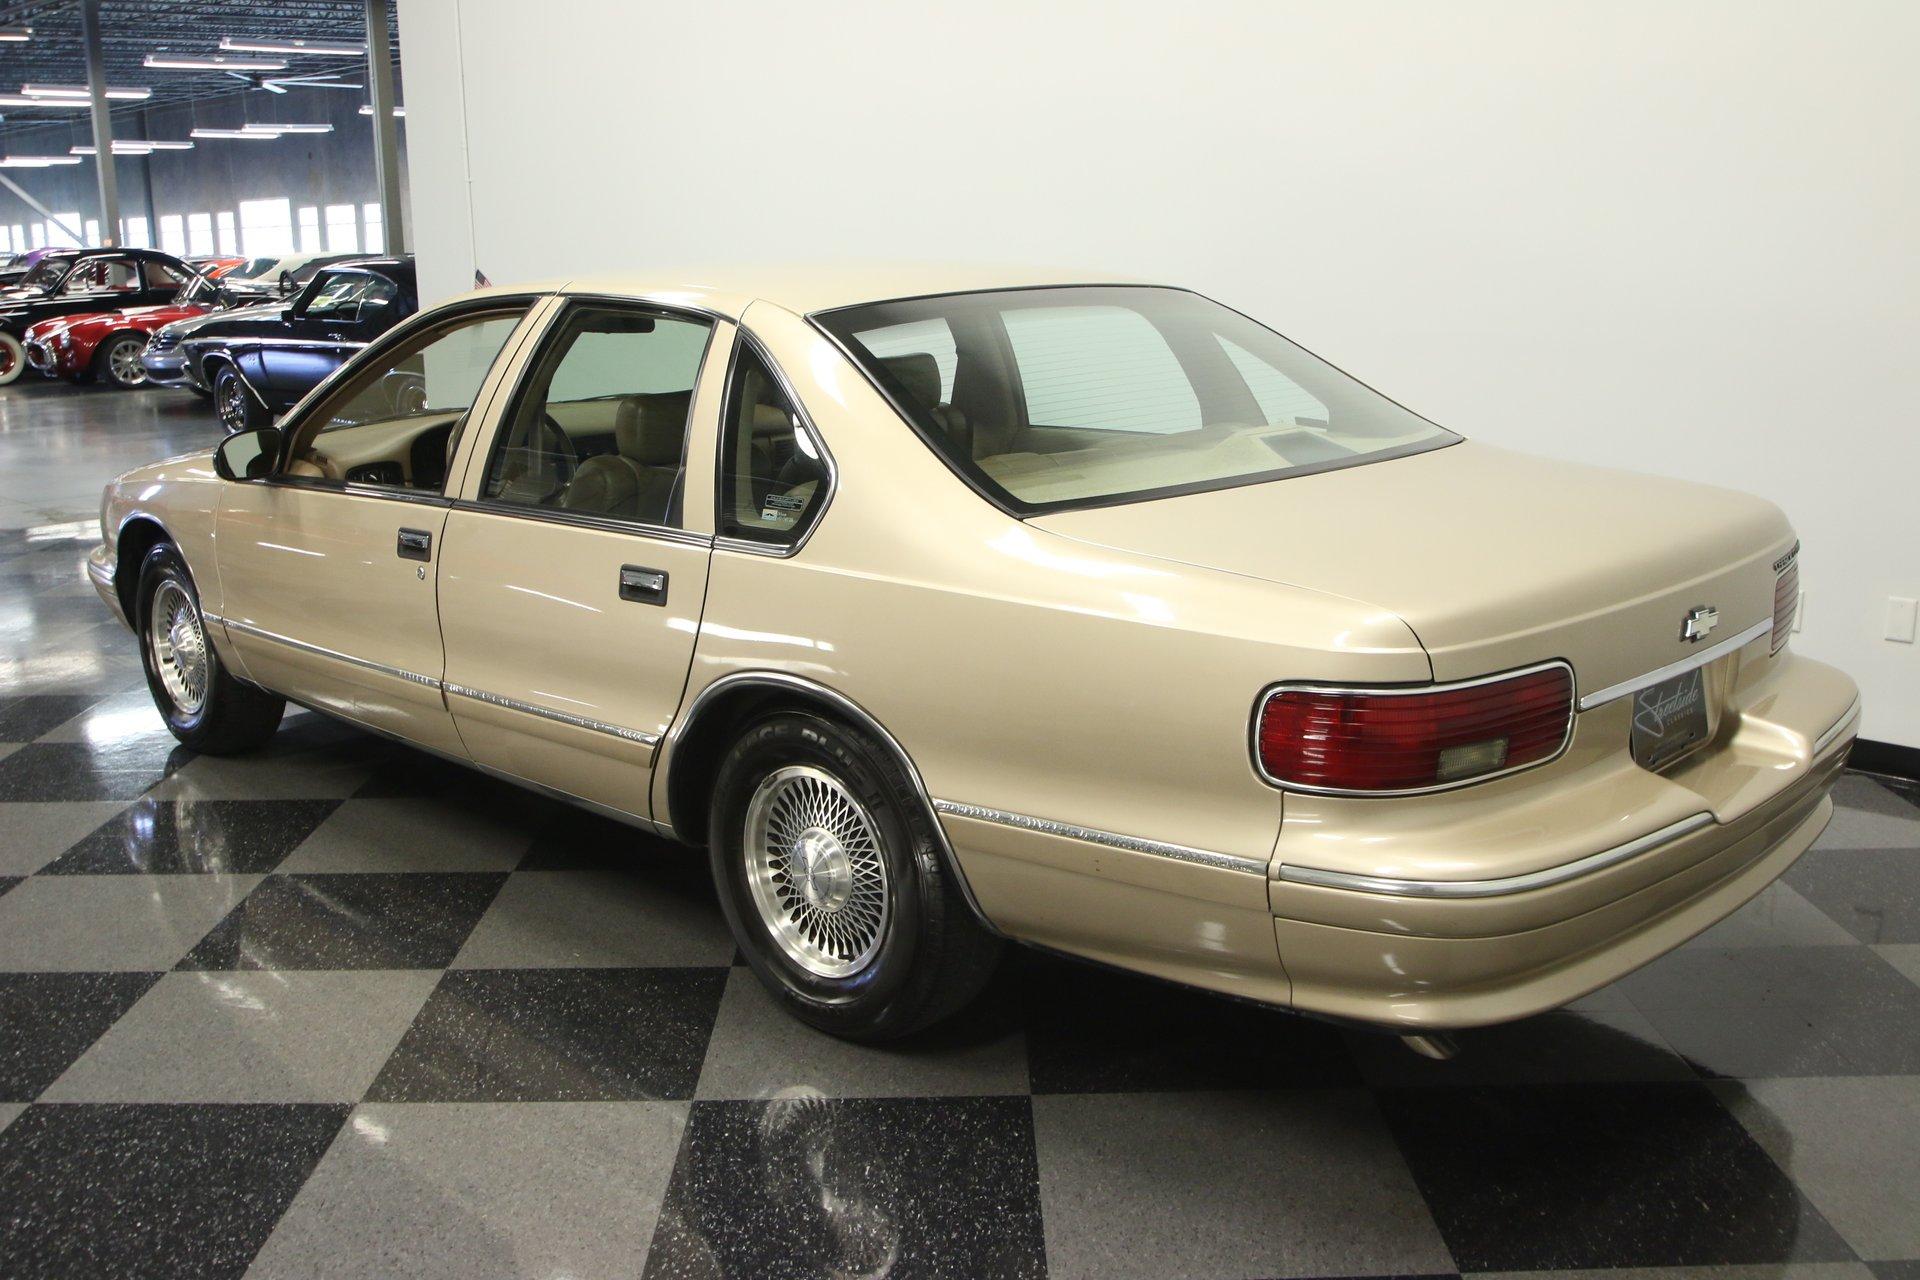 1996 Chevrolet Caprice Classic for sale #48599 | MCG